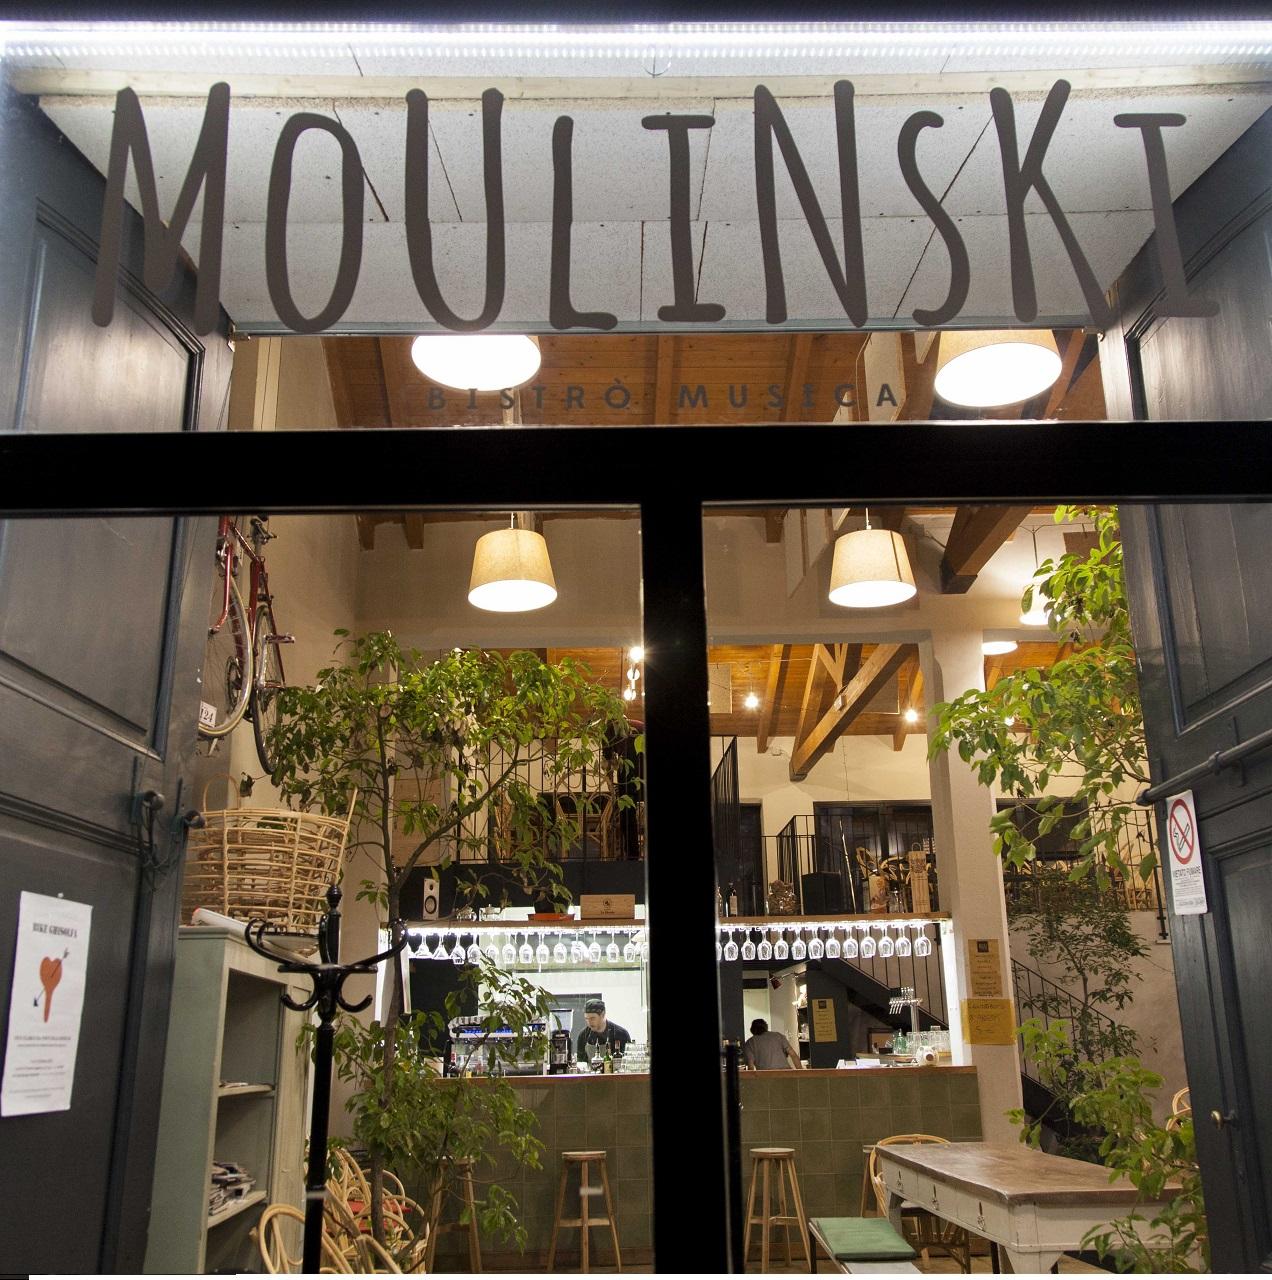 Moulinski